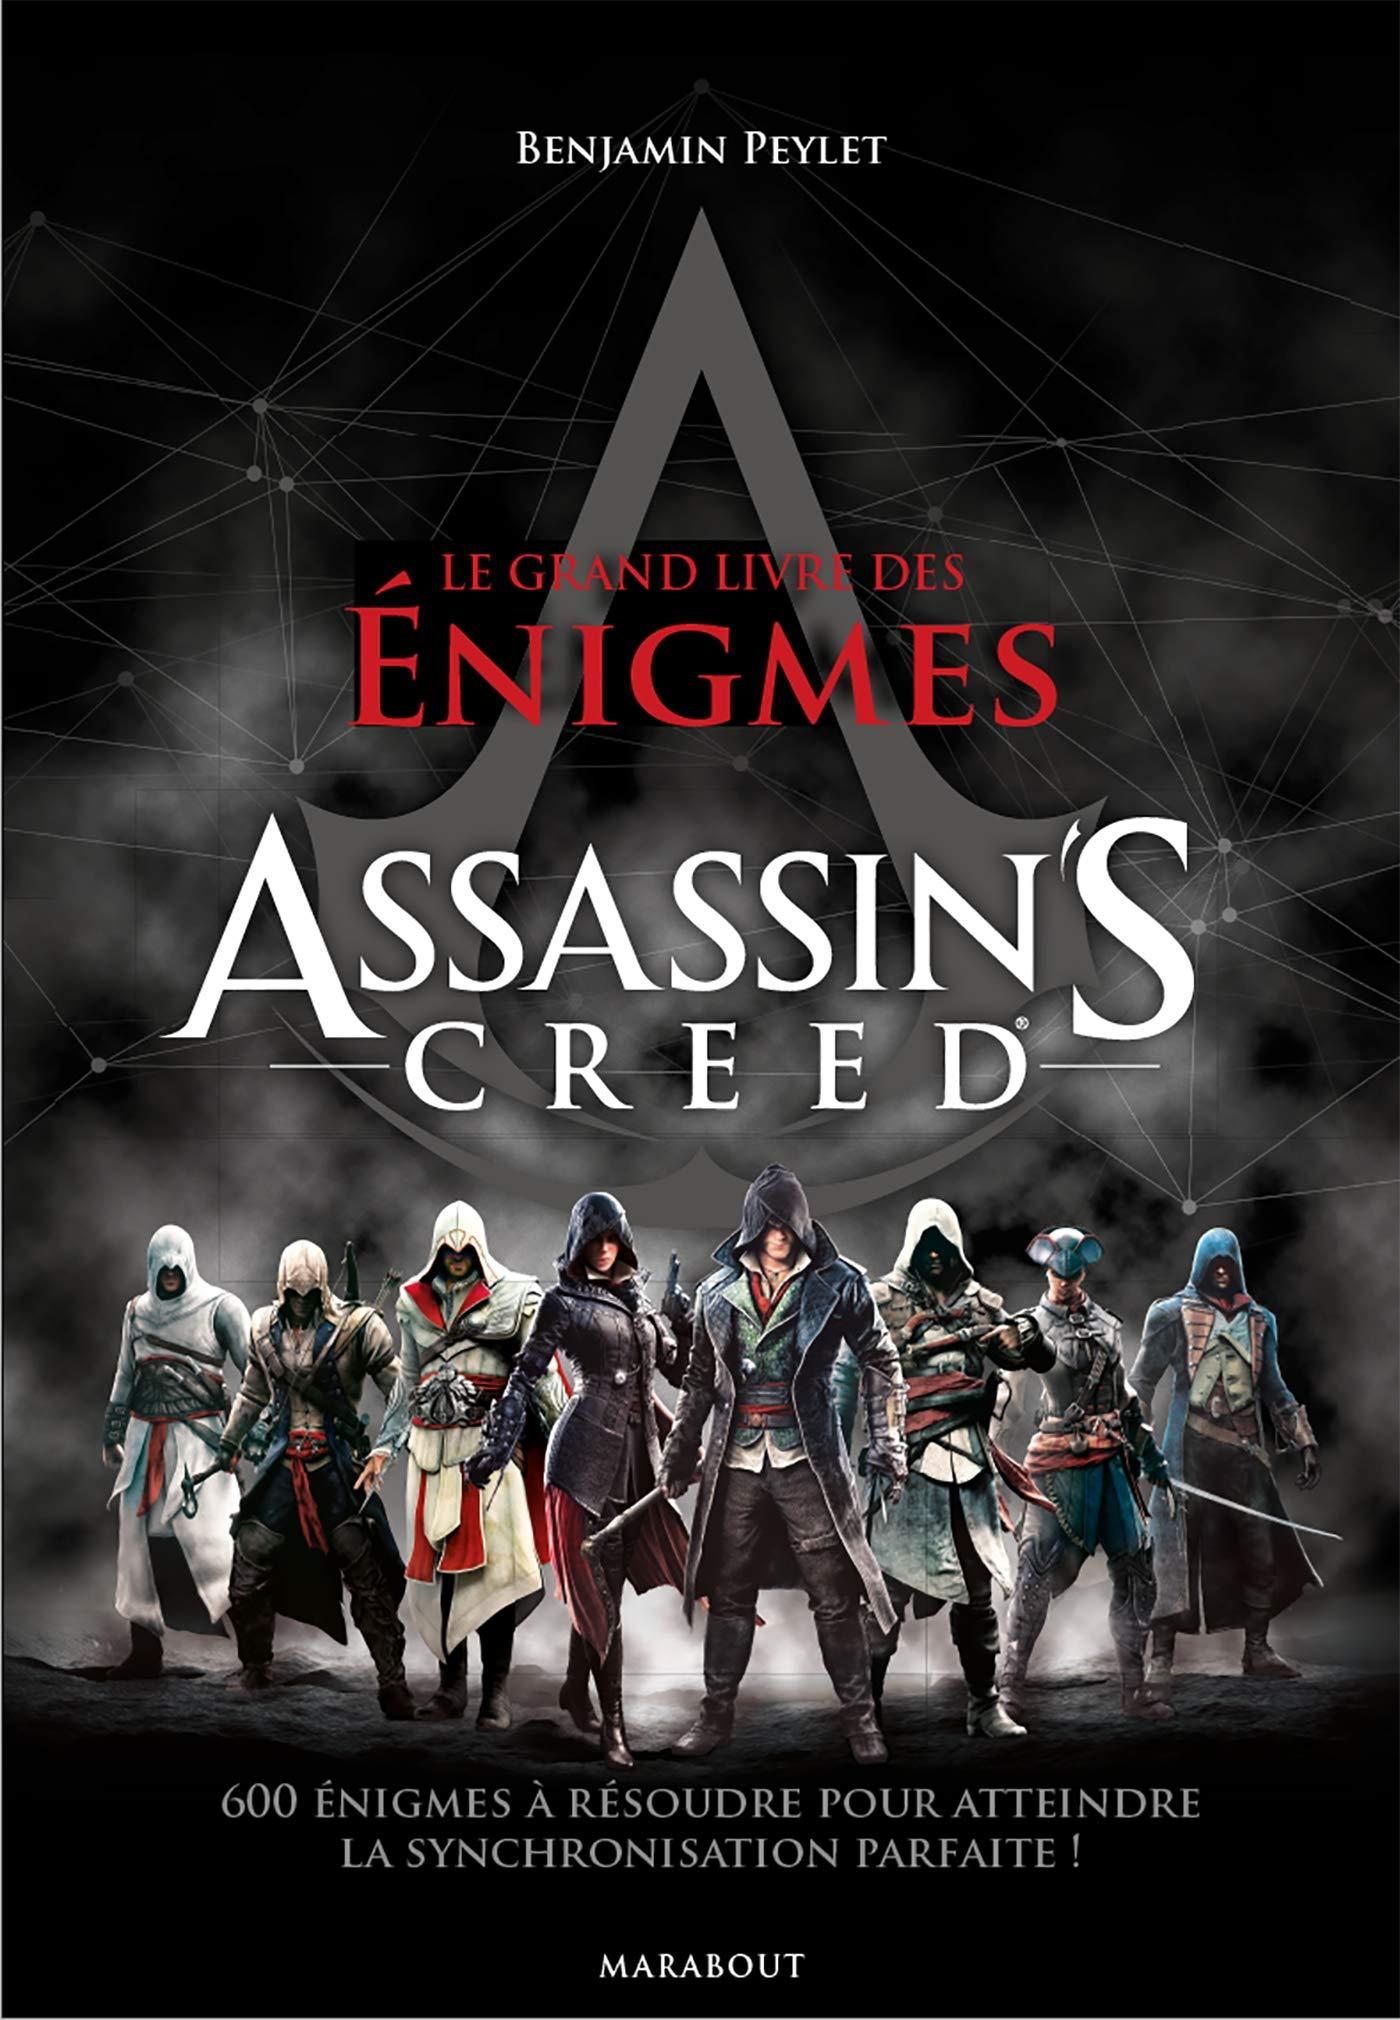 Assassin's Creed: Le grand livre des énigmes